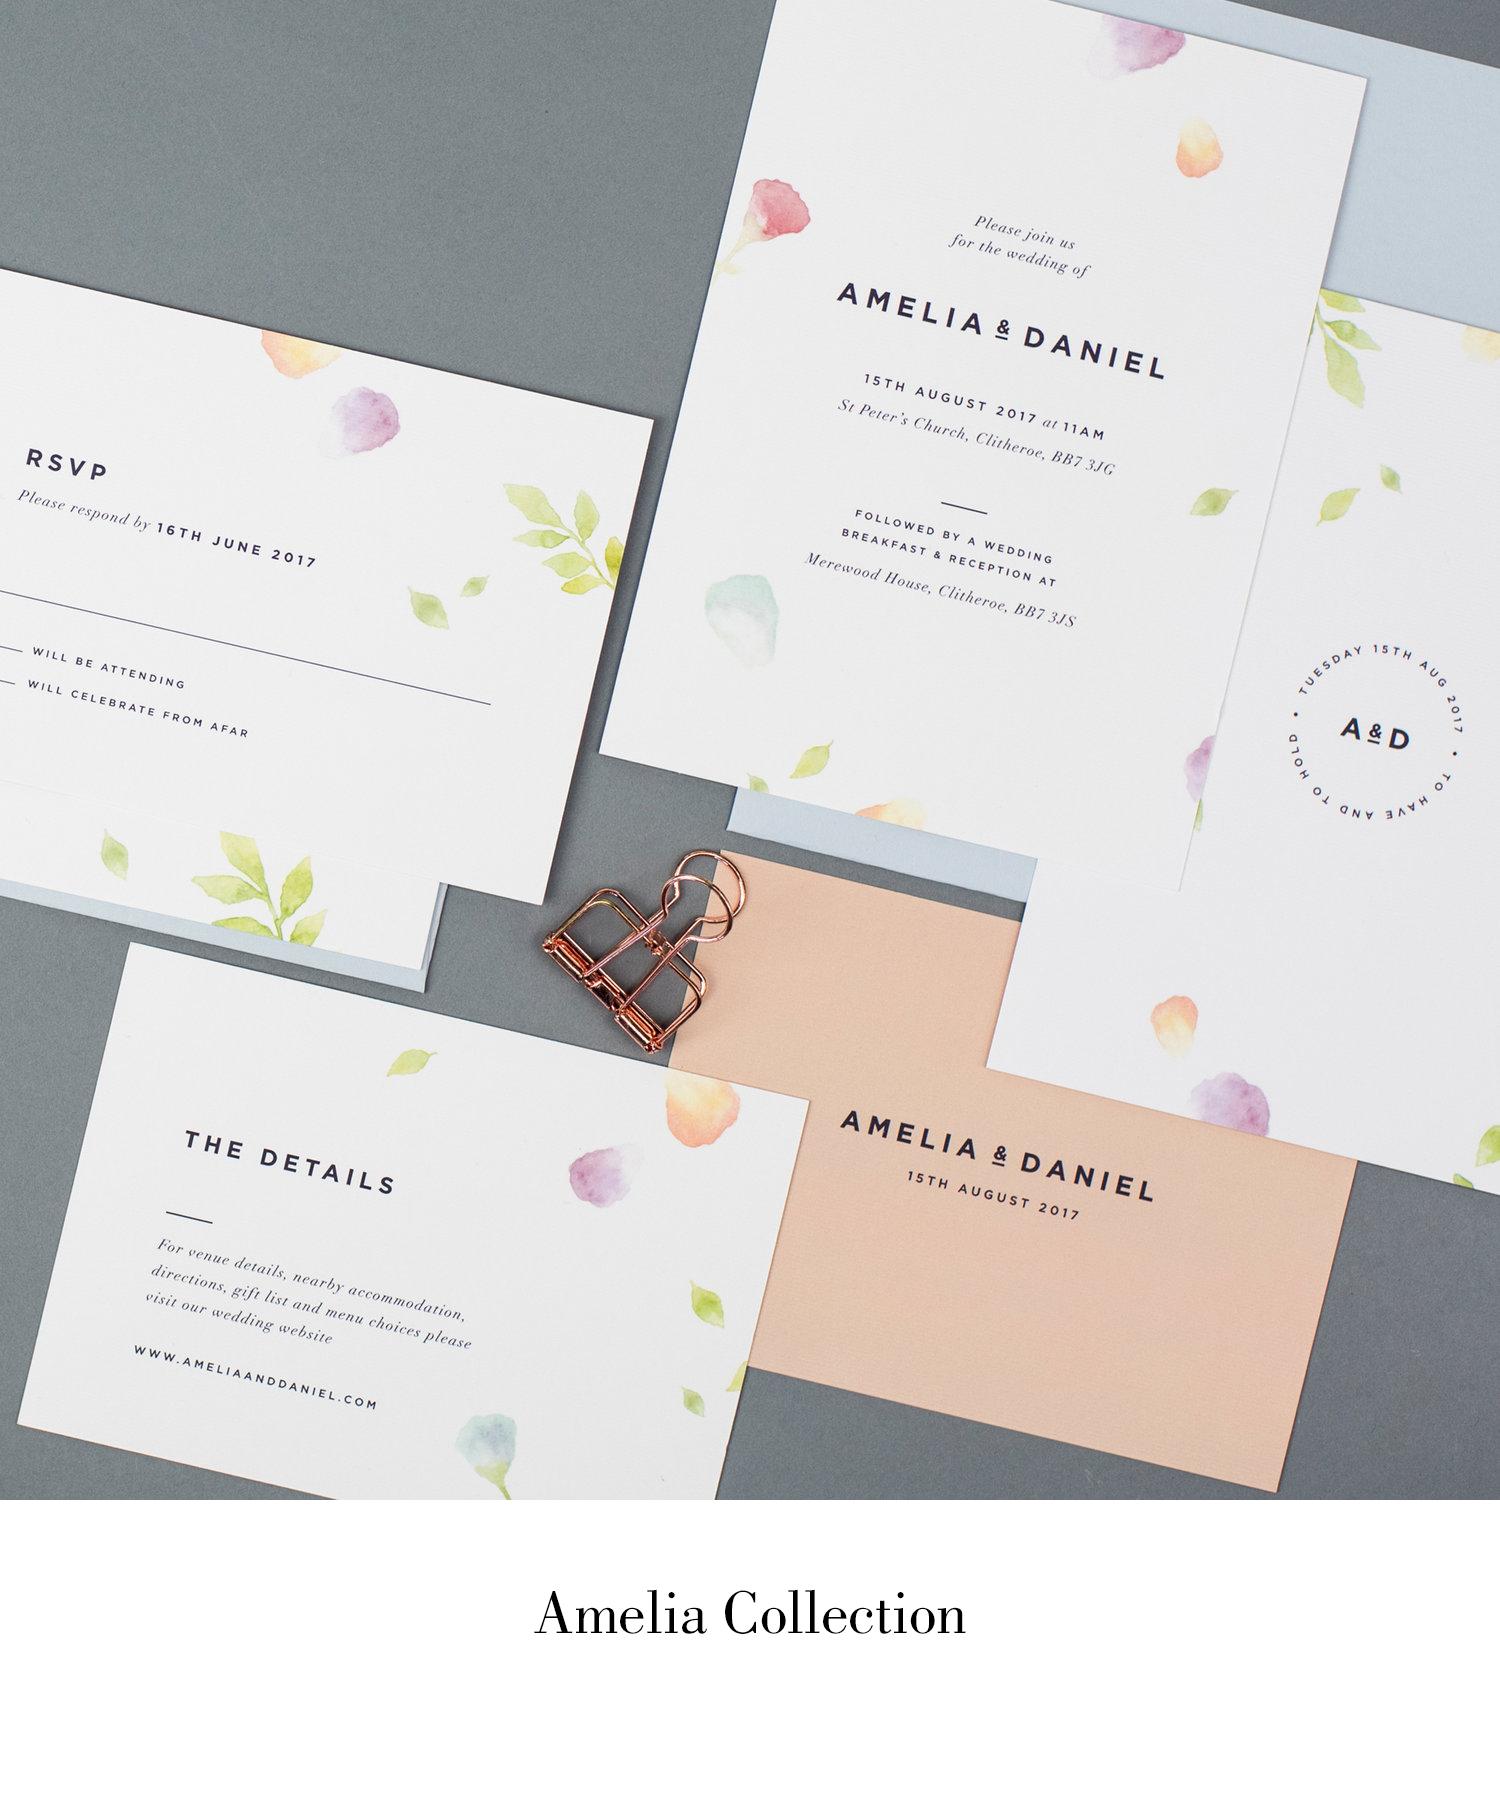 Amelia Collection.jpg